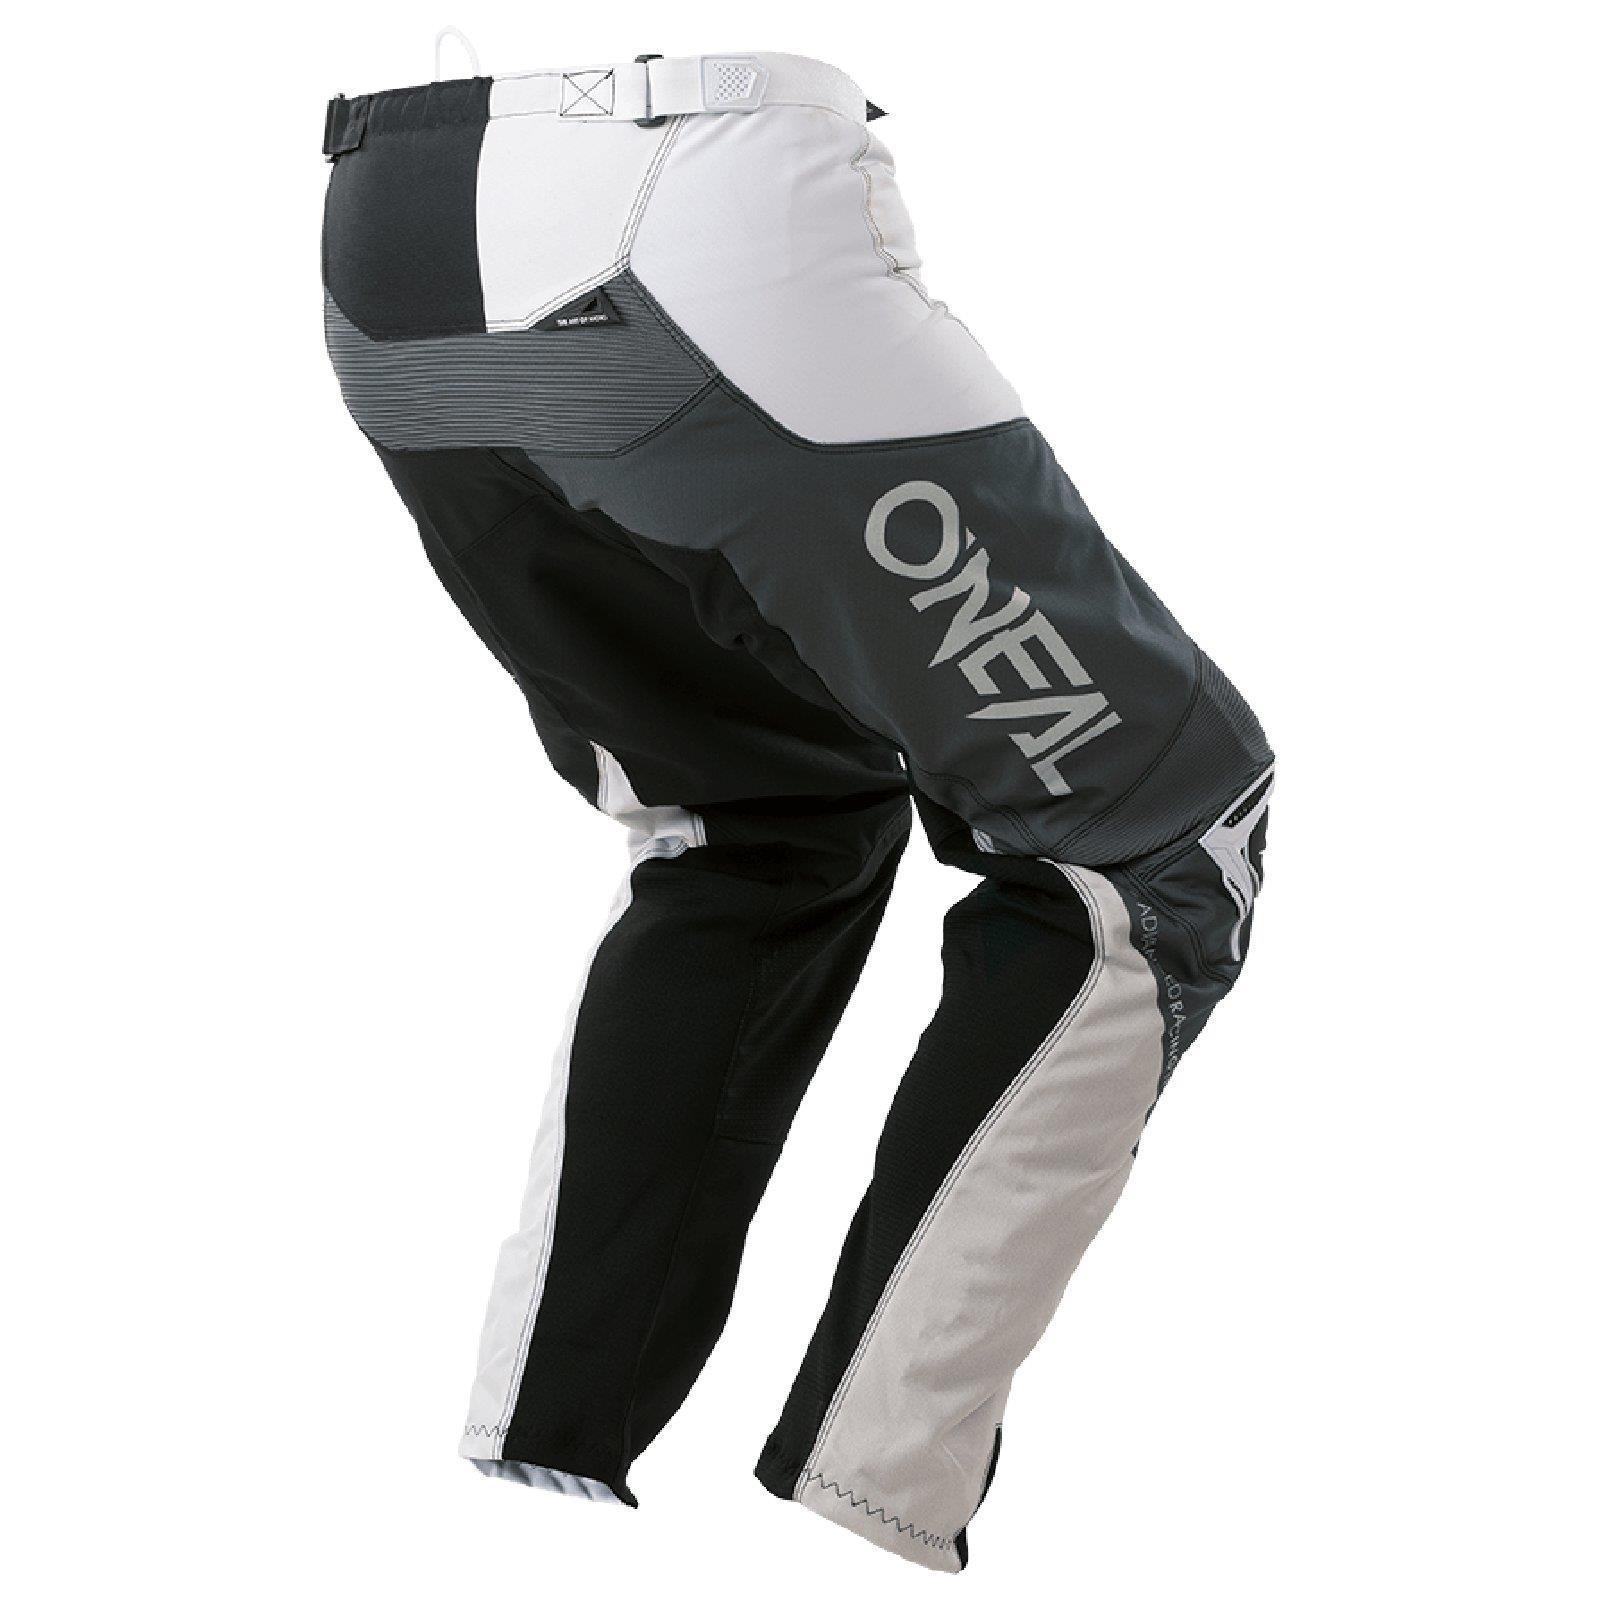 Bicicleta-de-montana-Enduro-MTB-downhill-pantalones-los-pantalones-oNeal-mayhem-que-Lite-split-Moto miniatura 9